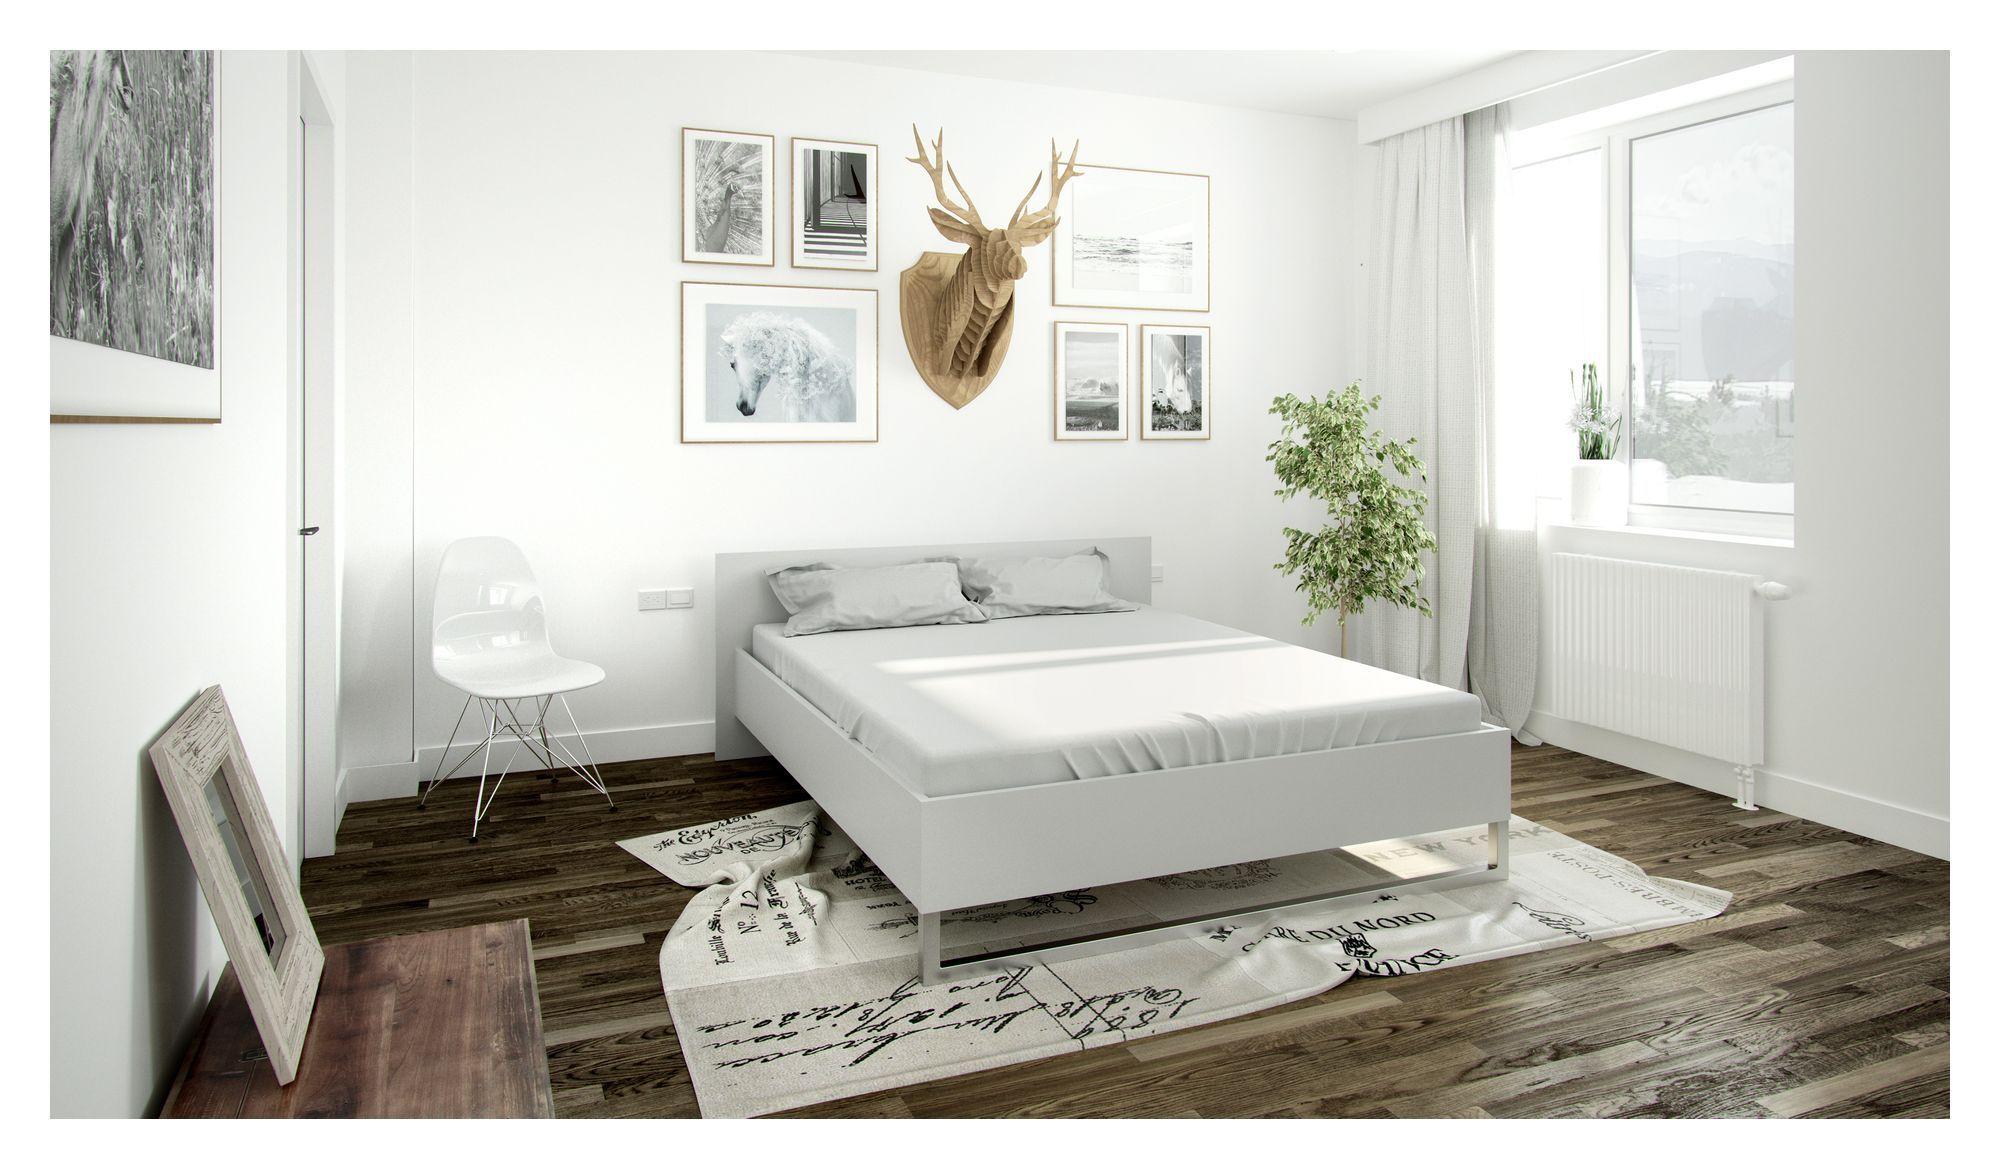 Style Sengeramme - Hvid 160x200 - Hvid seng - 160x200 cm